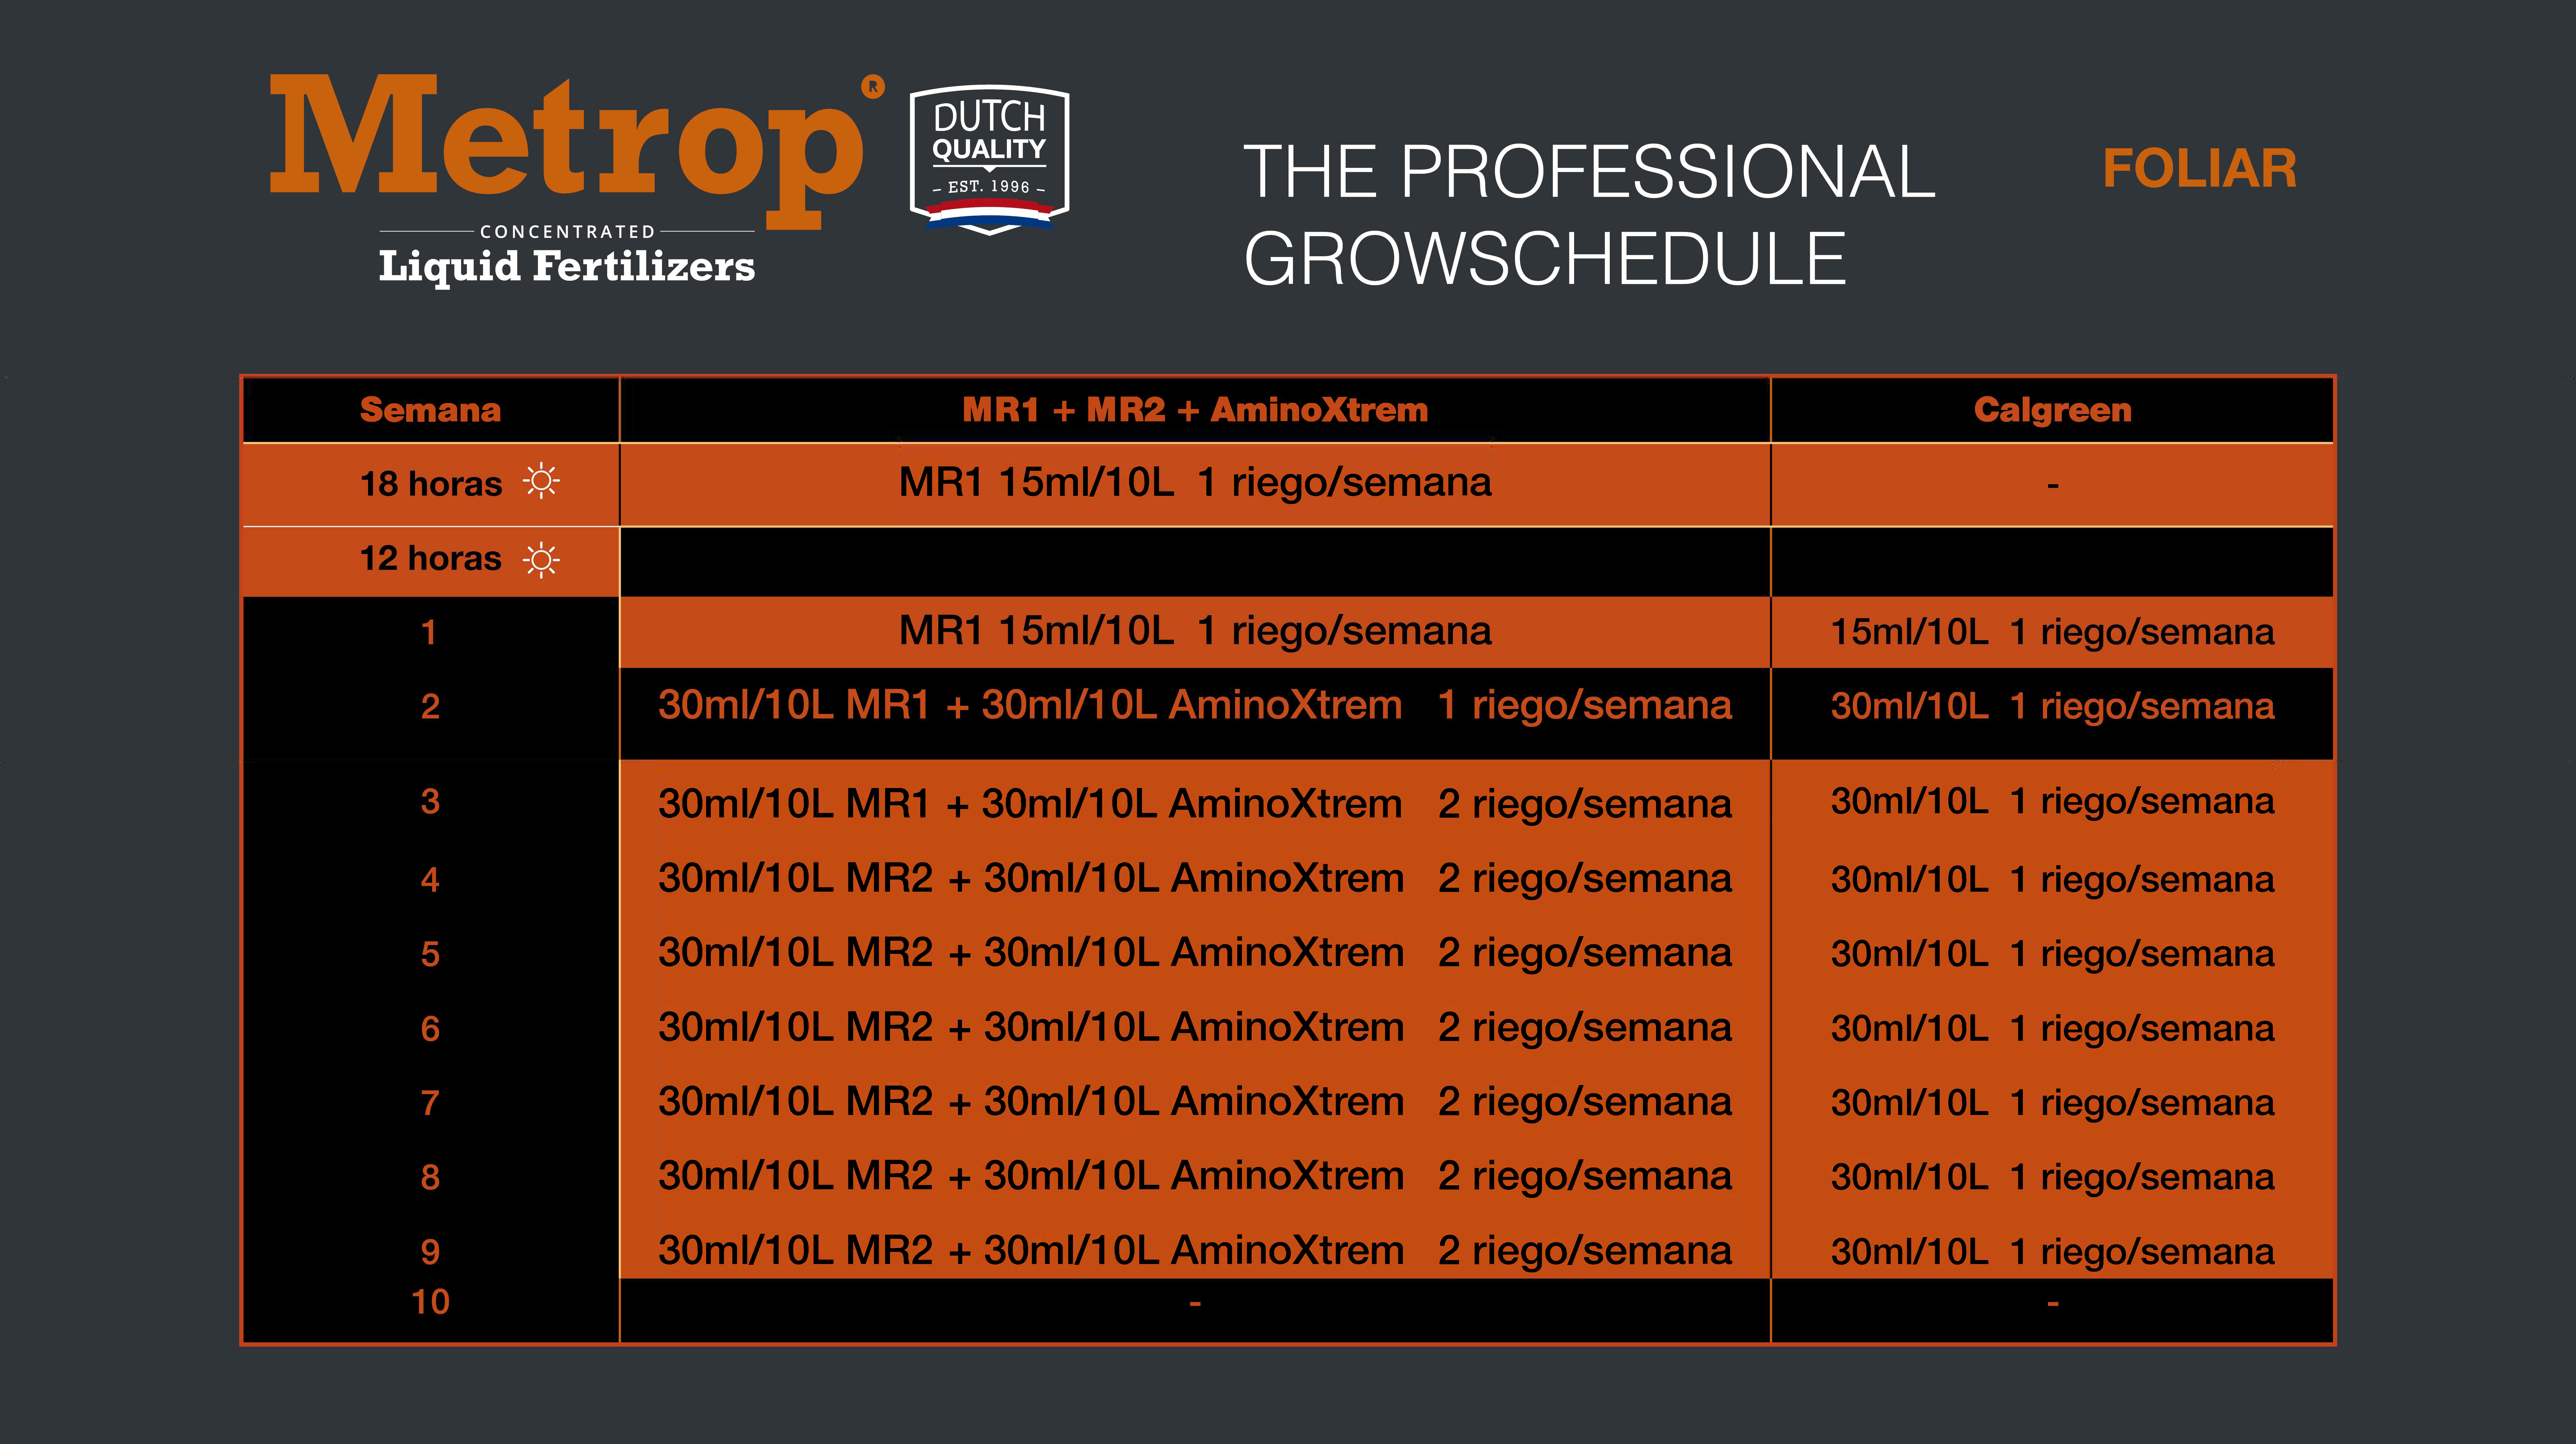 THE PROFESSIONAL GROWSCHEDULE METROP